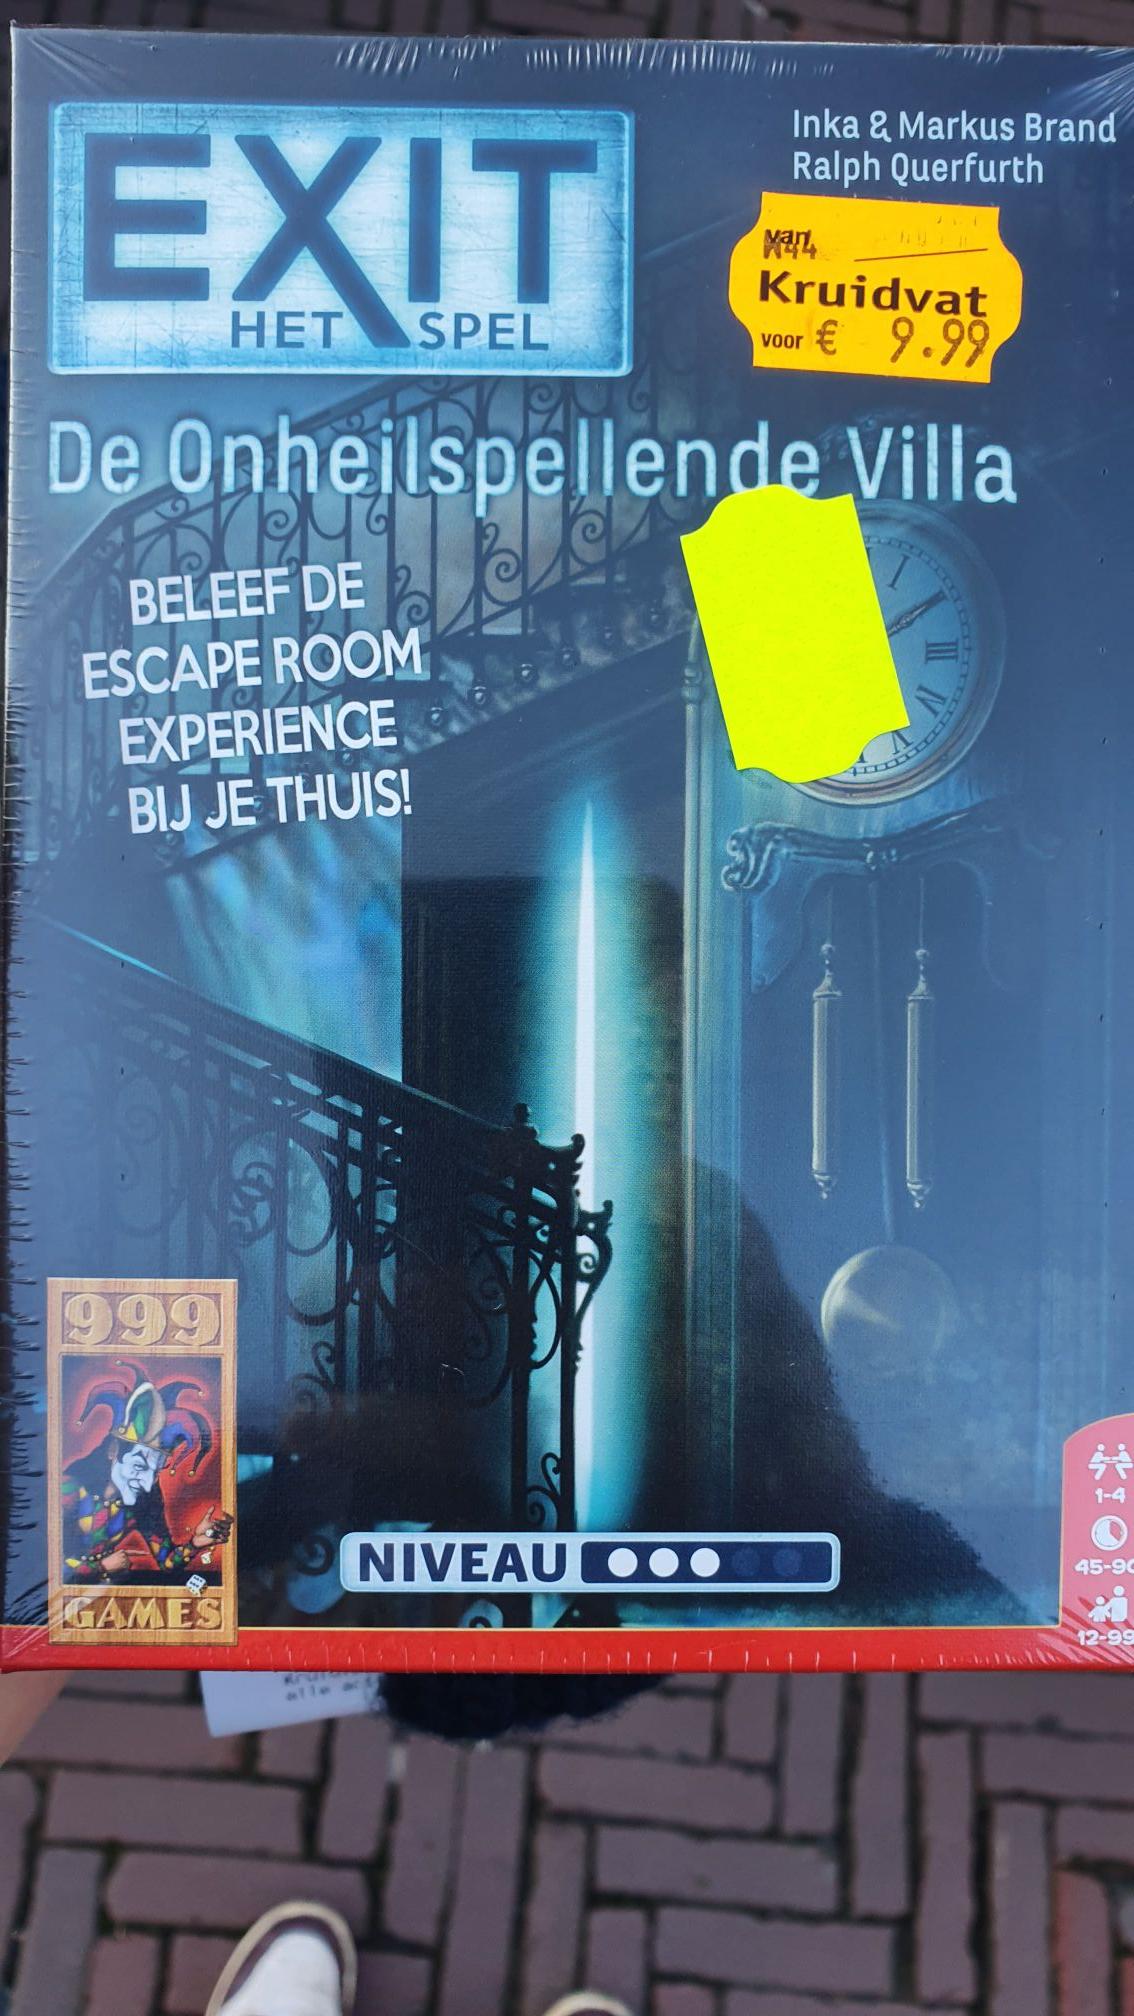 Escape Game: De onheilspellende Villa @Kruidvat voor 4,99